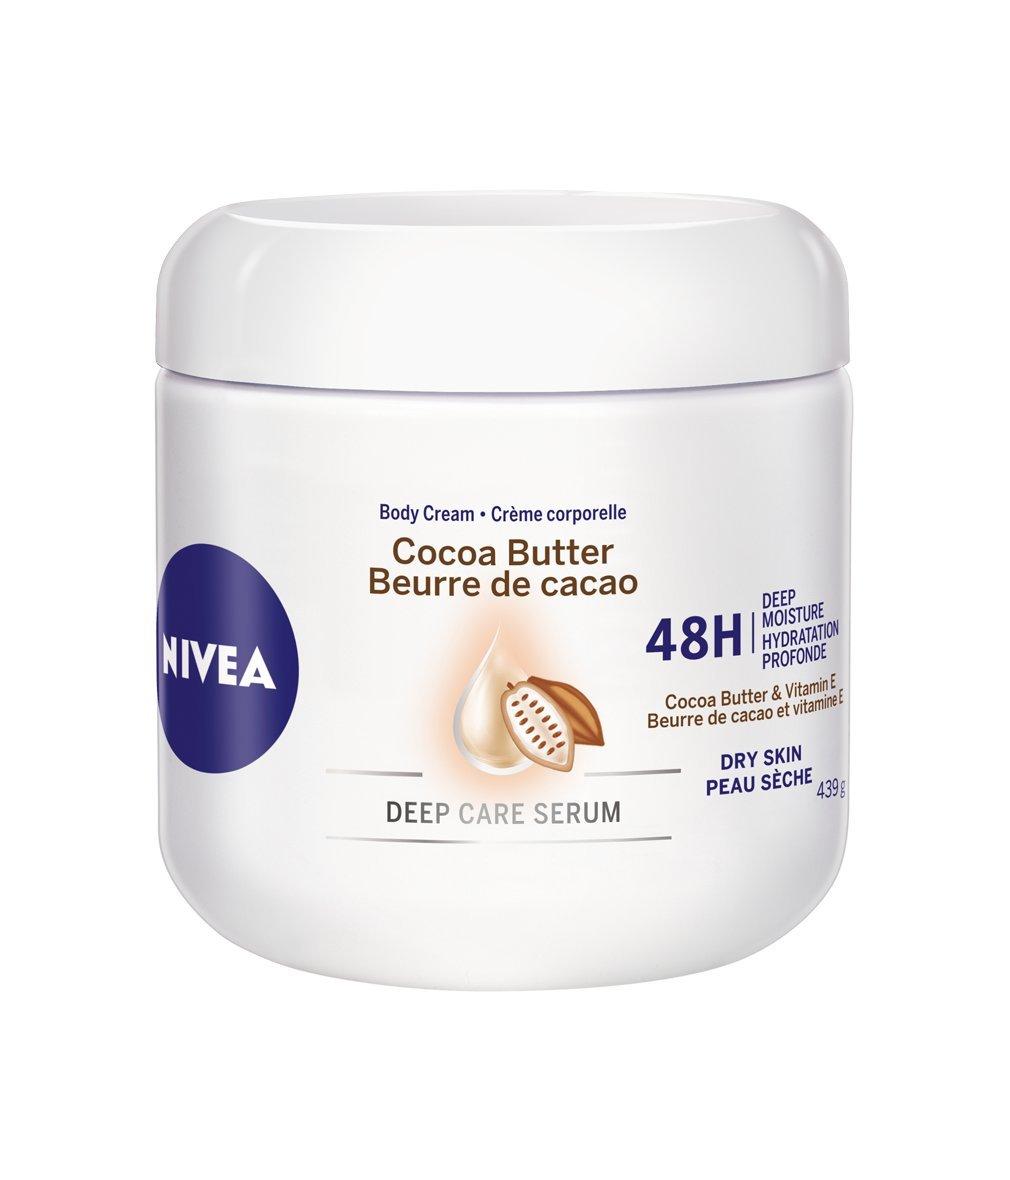 NIVEA Cocoa Butter 48H Deep Moisture Body Cream for Dry Skin, 439 g Beiersdorf Canada Inc. 056594011090